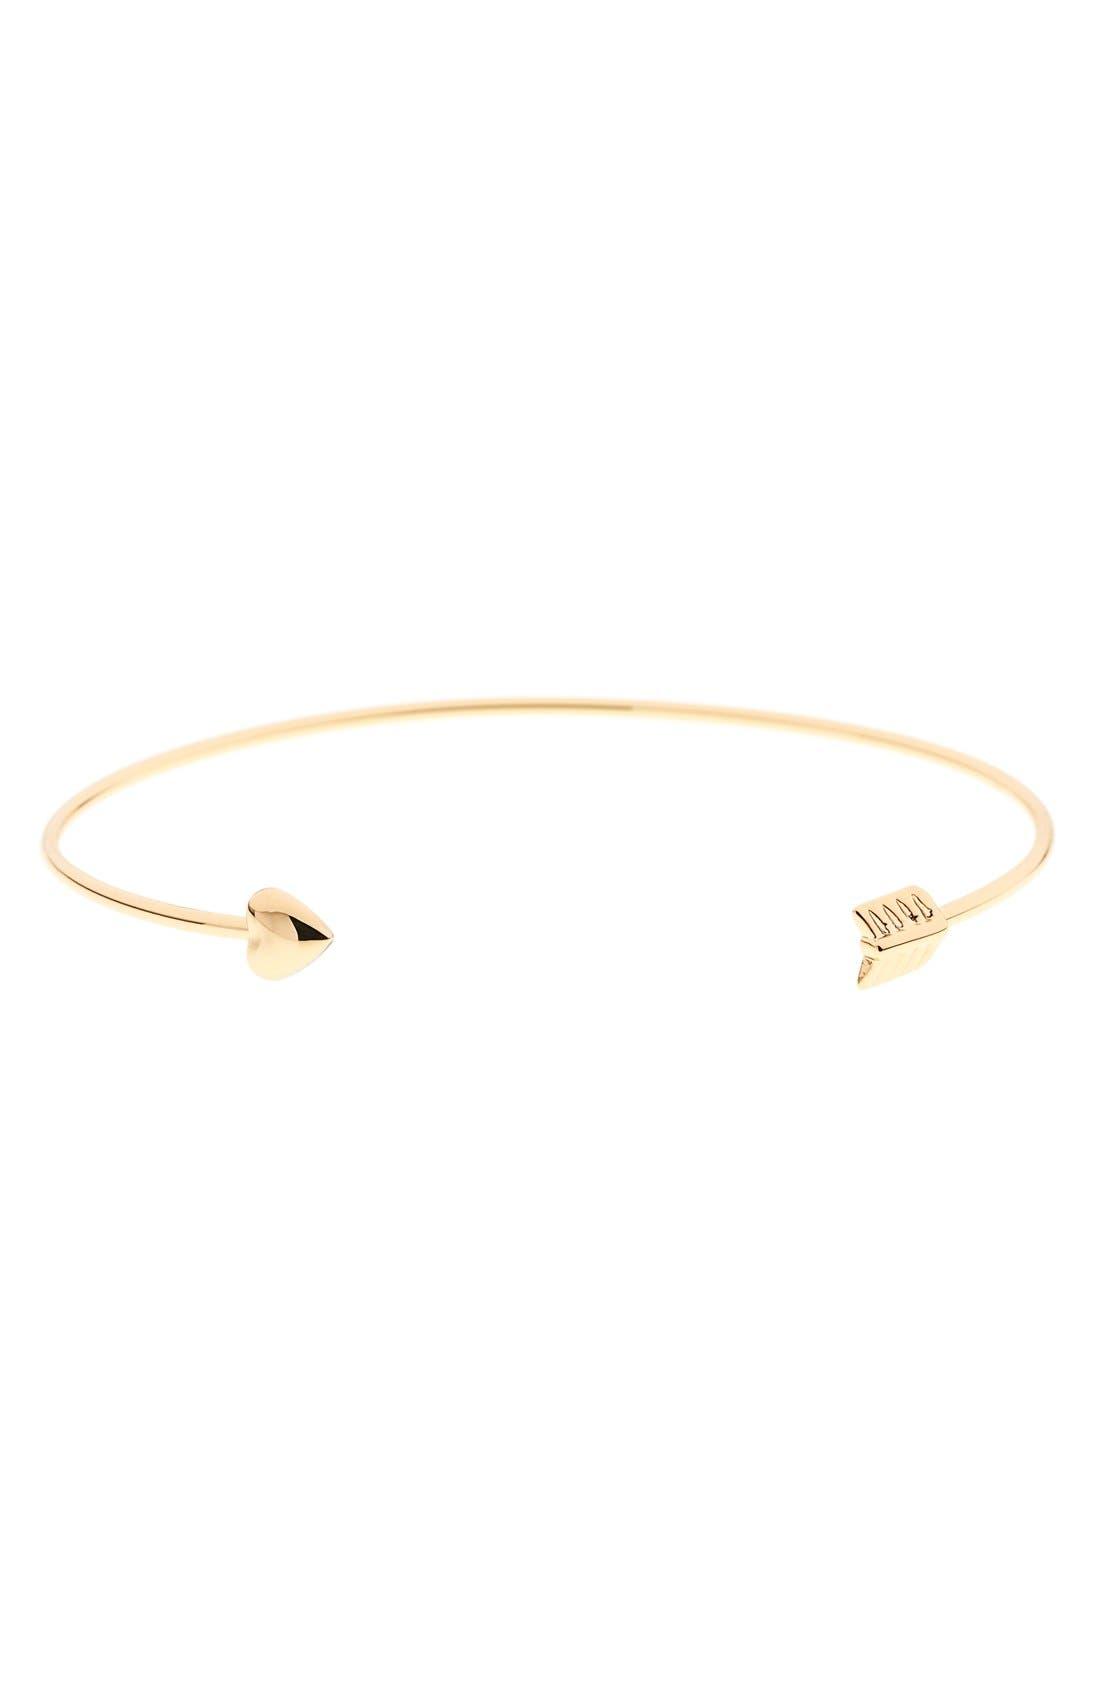 'Cupid's Arrow' Open Cuff,                         Main,                         color, Gold